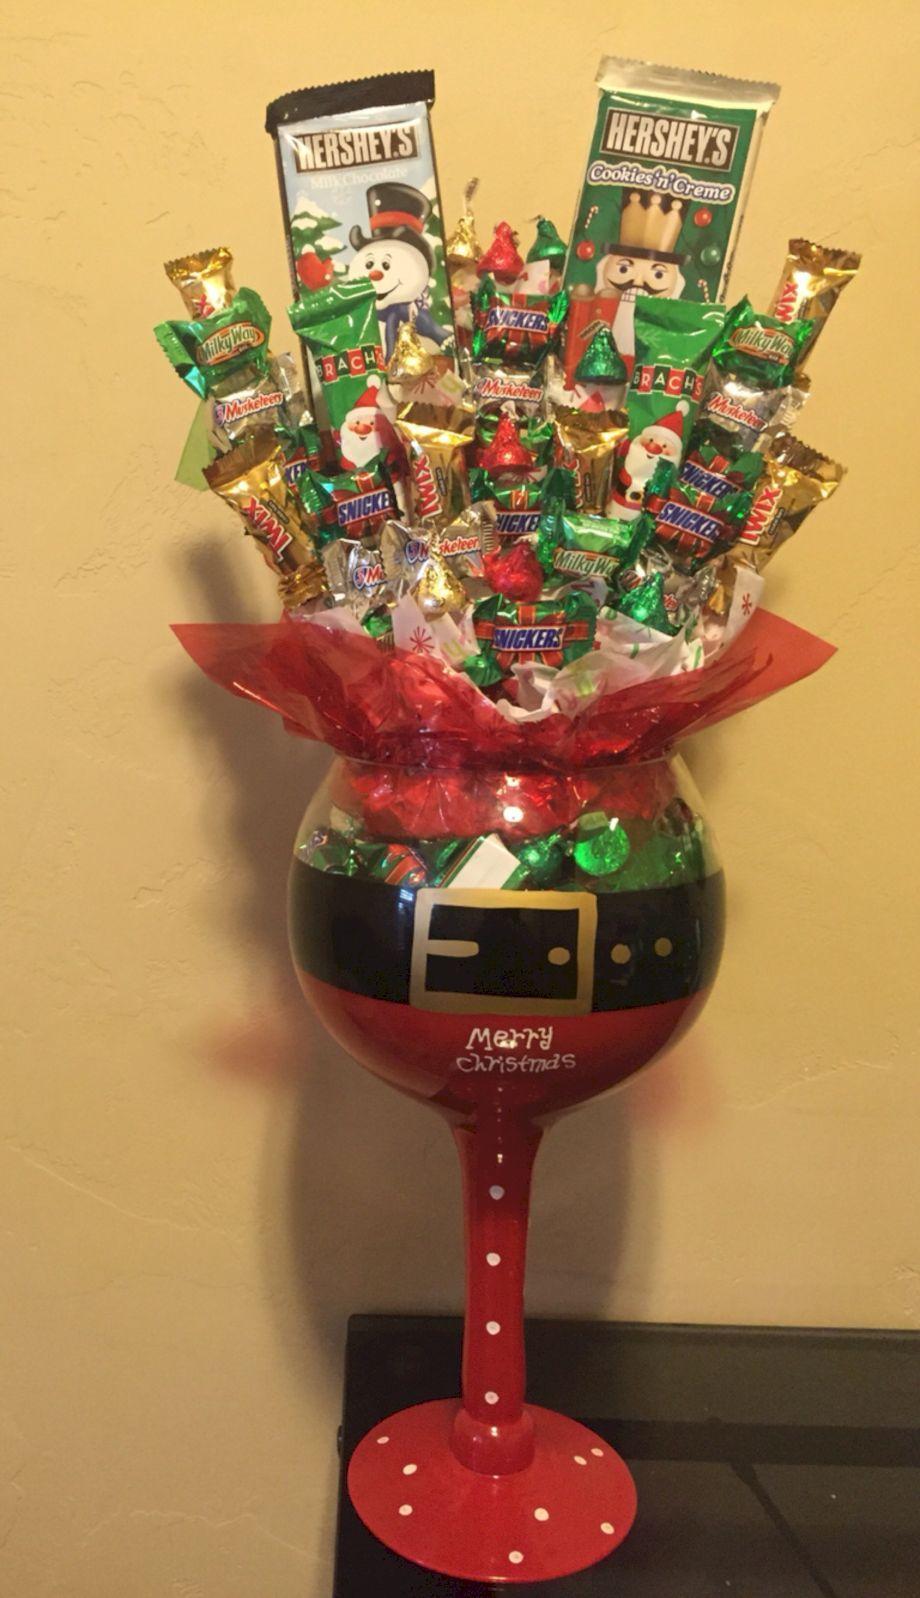 54 Amazing Diy Wine Gift Baskets Ideas Homemade Christmas Gifts Diy Christmas Gifts Homemade Christmas